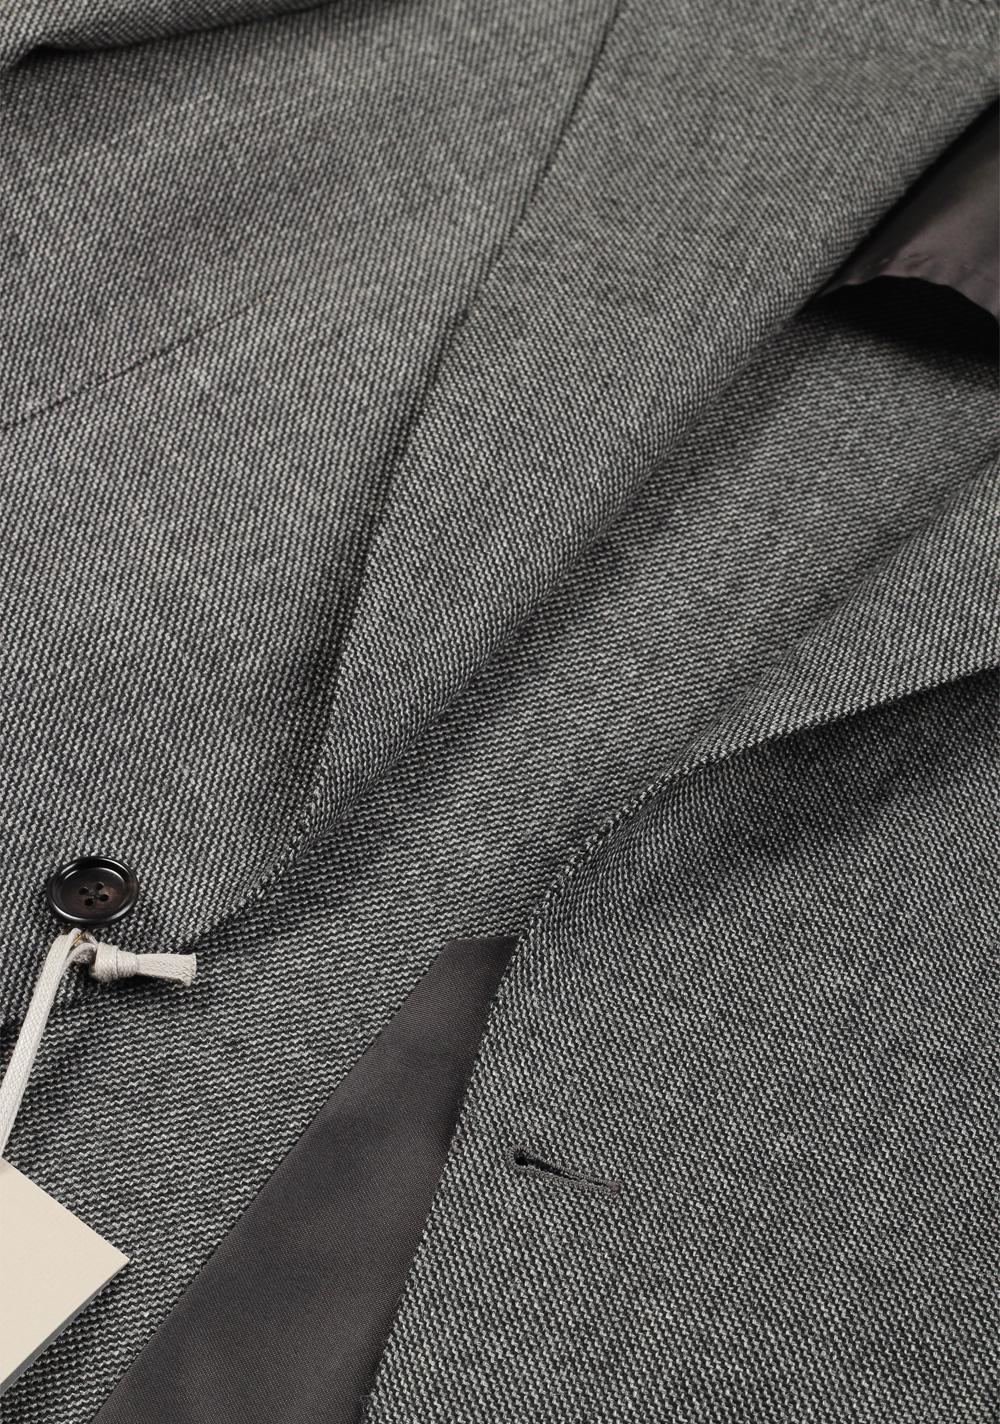 TOM FORD Atticus Gray Sport Coat Size 46 / 36R U.S.   Costume Limité